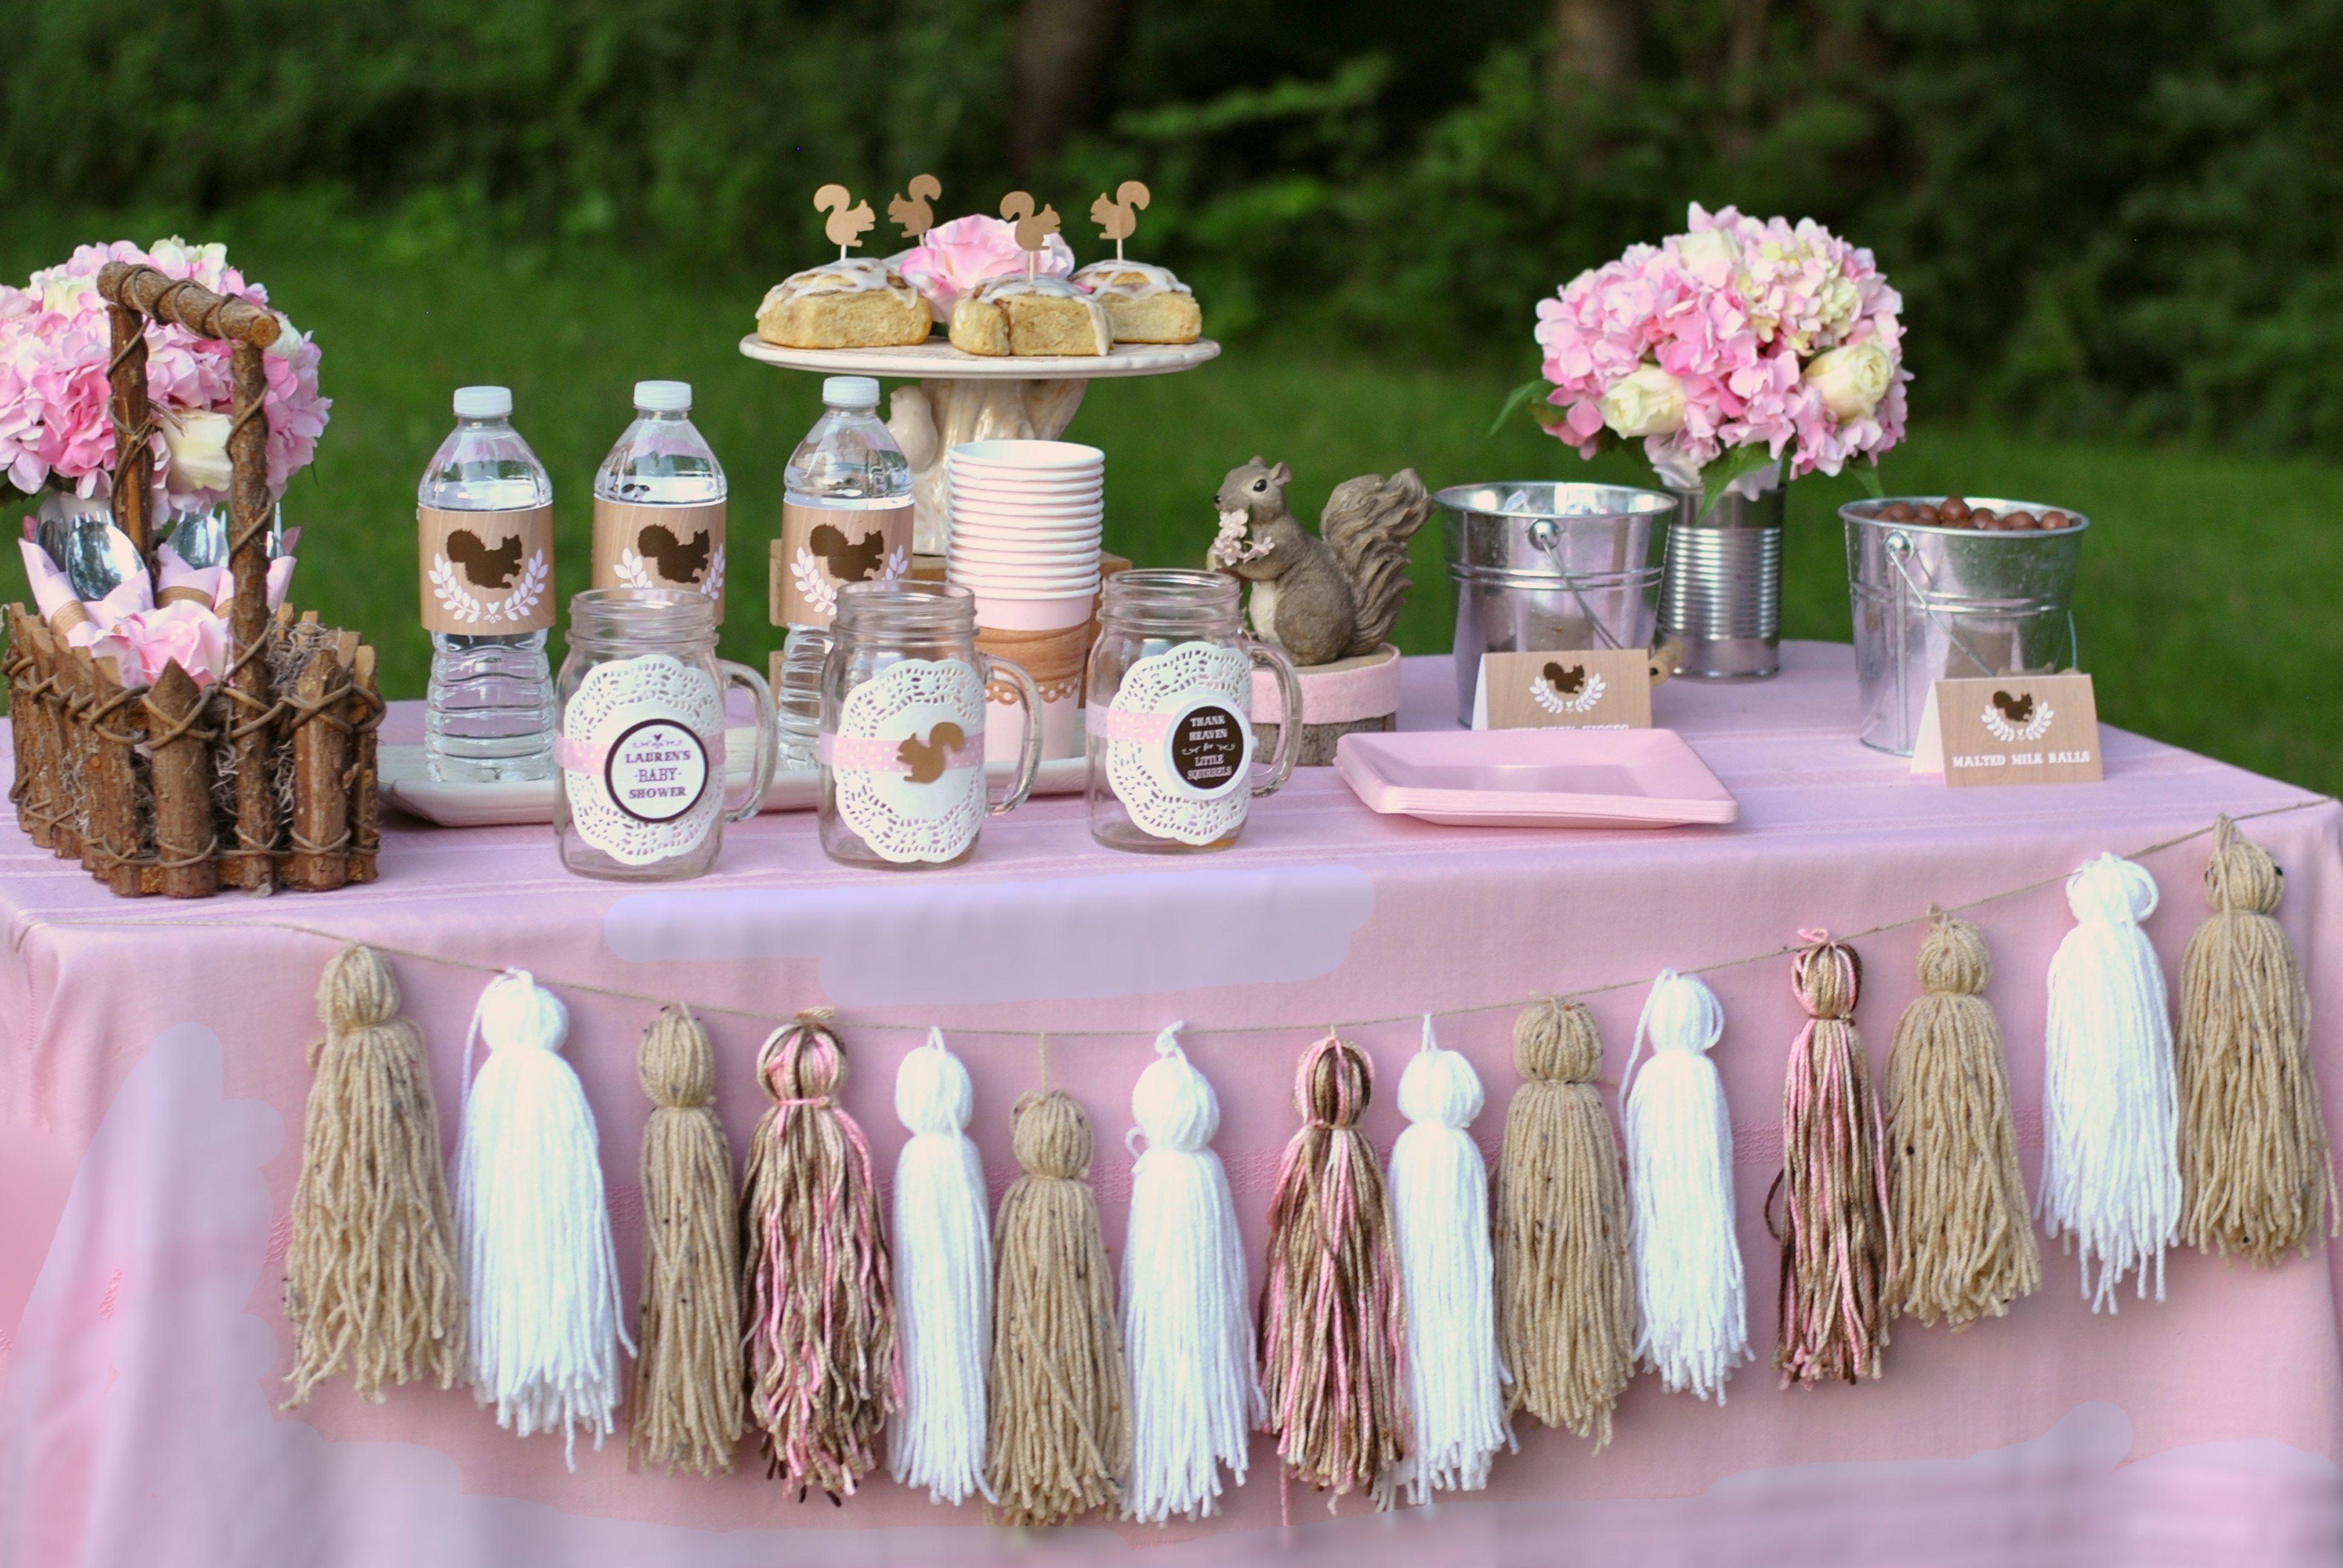 10 Fantastic Baby Girl Shower Decoration Ideas baby shower theme ideas for girl omega center ideas for baby 3 2021